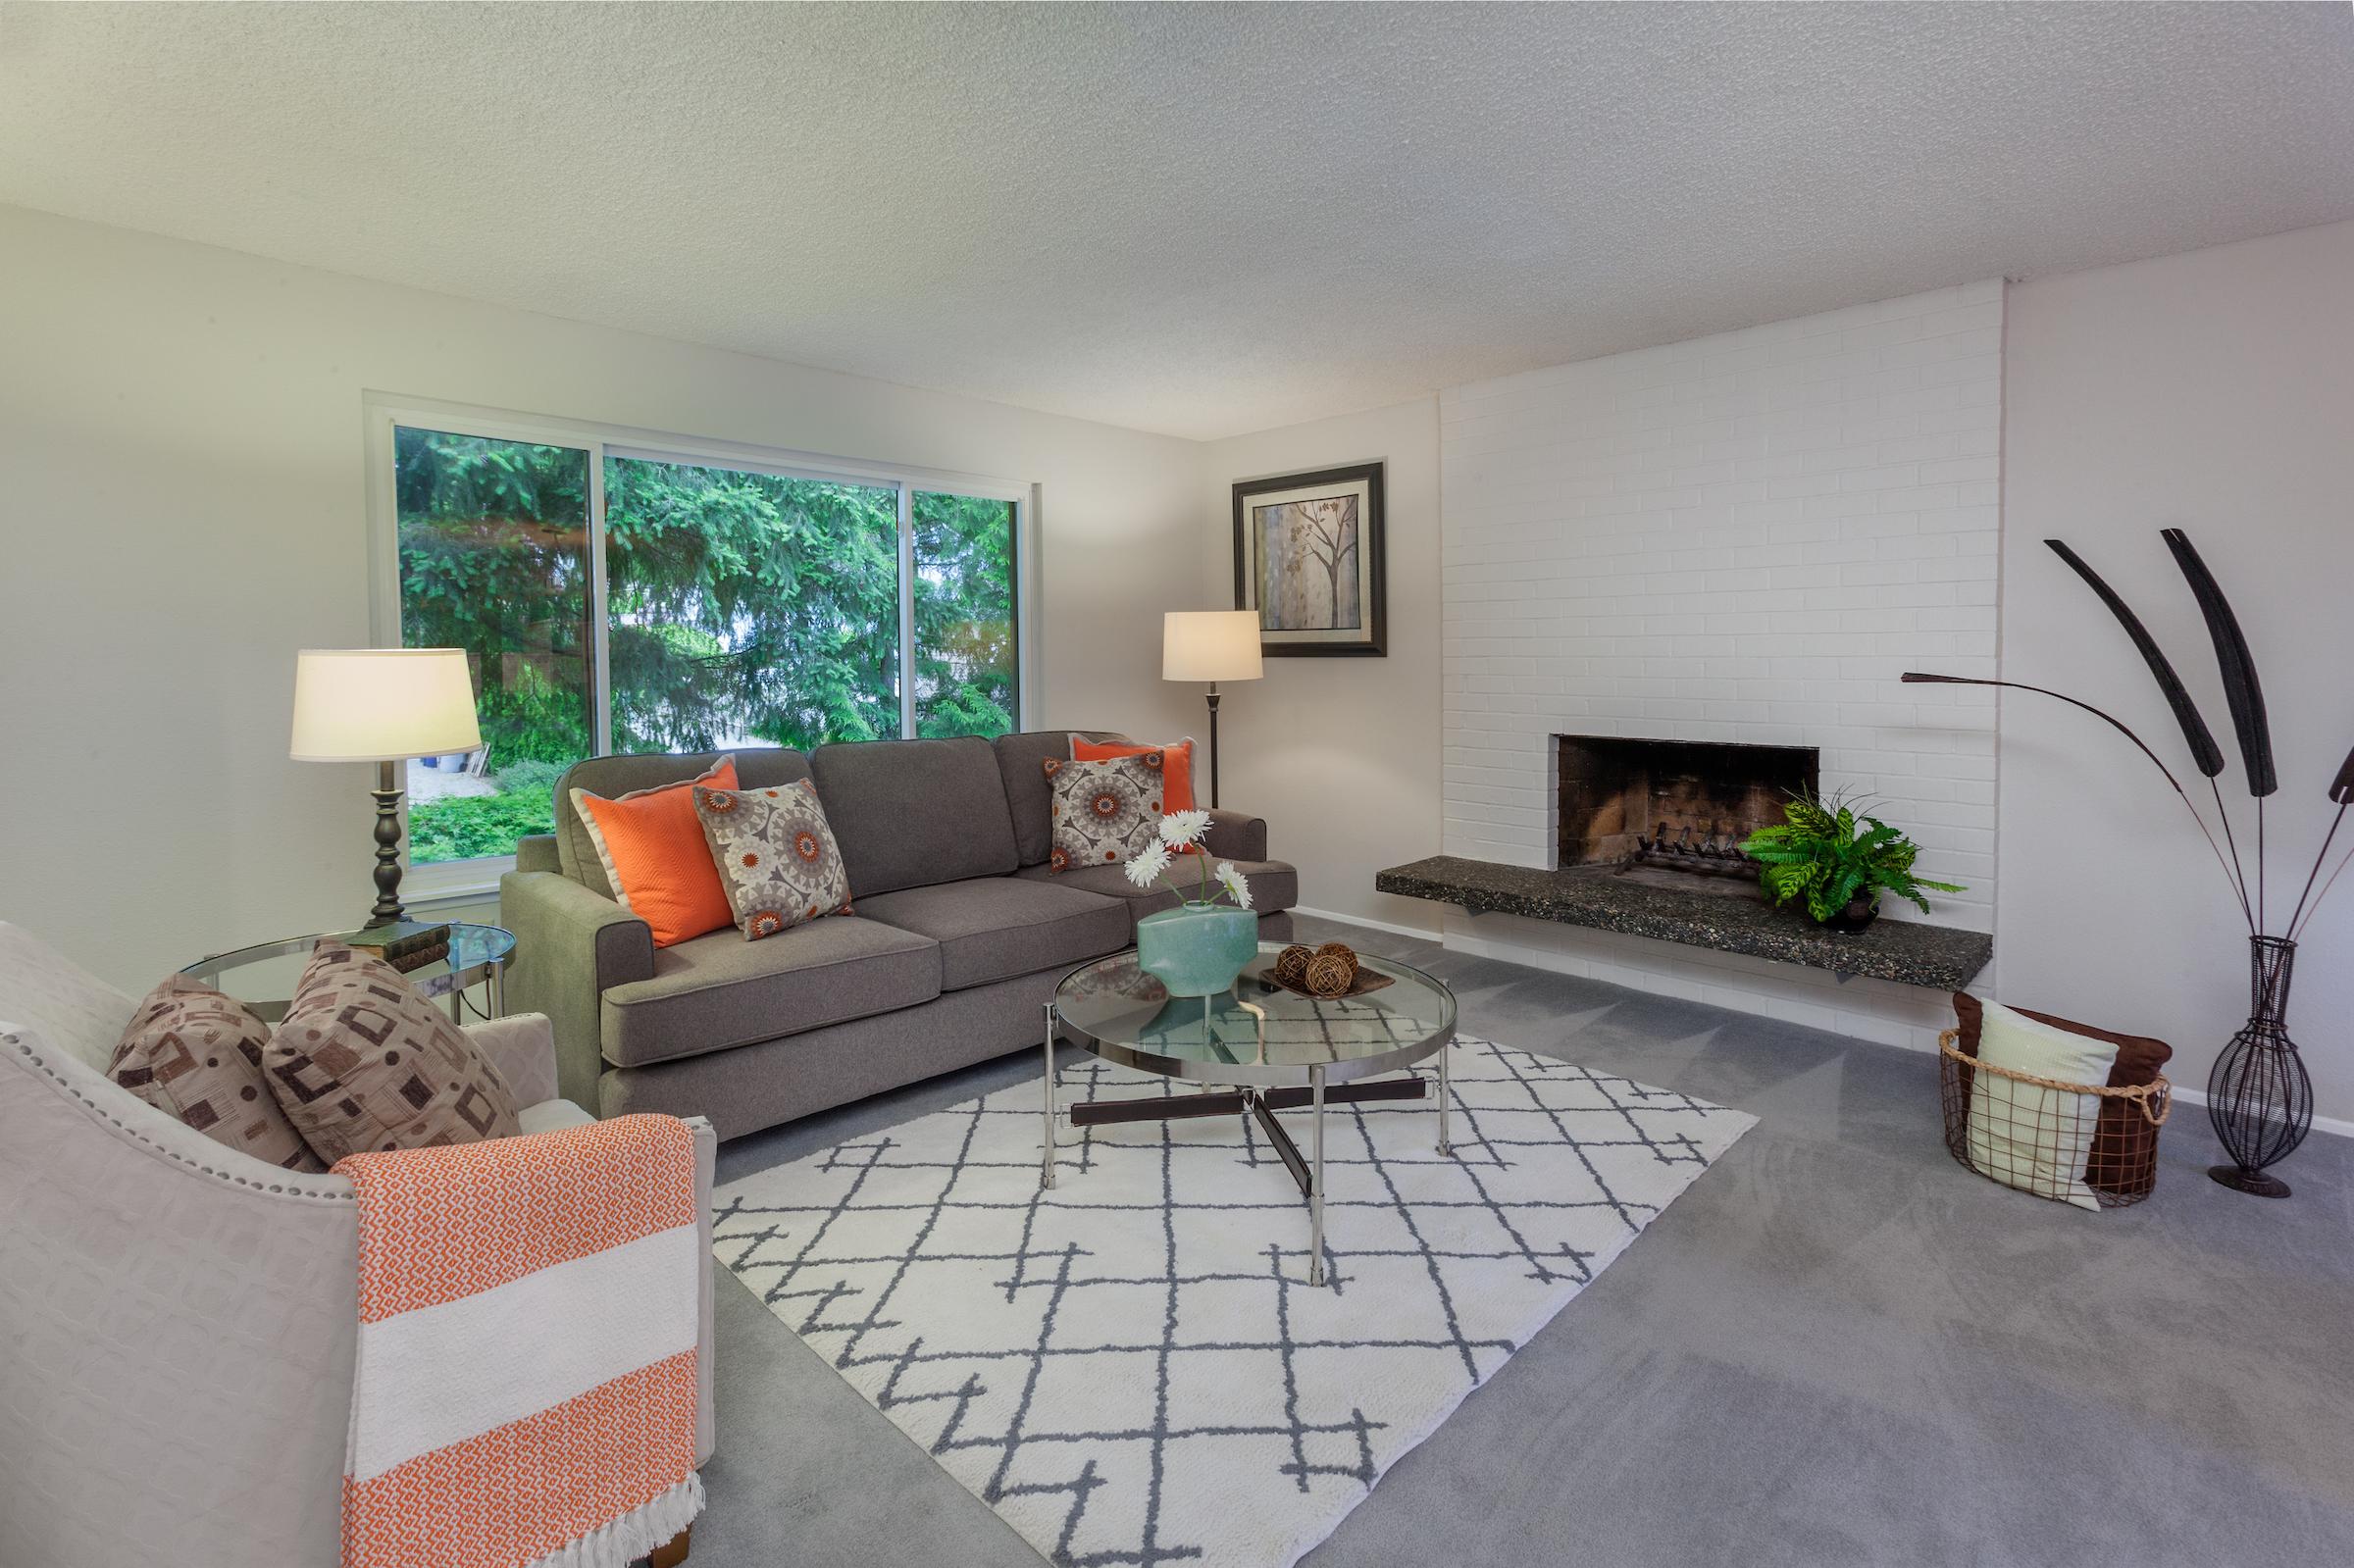 Living Room - Renton, Washington USA